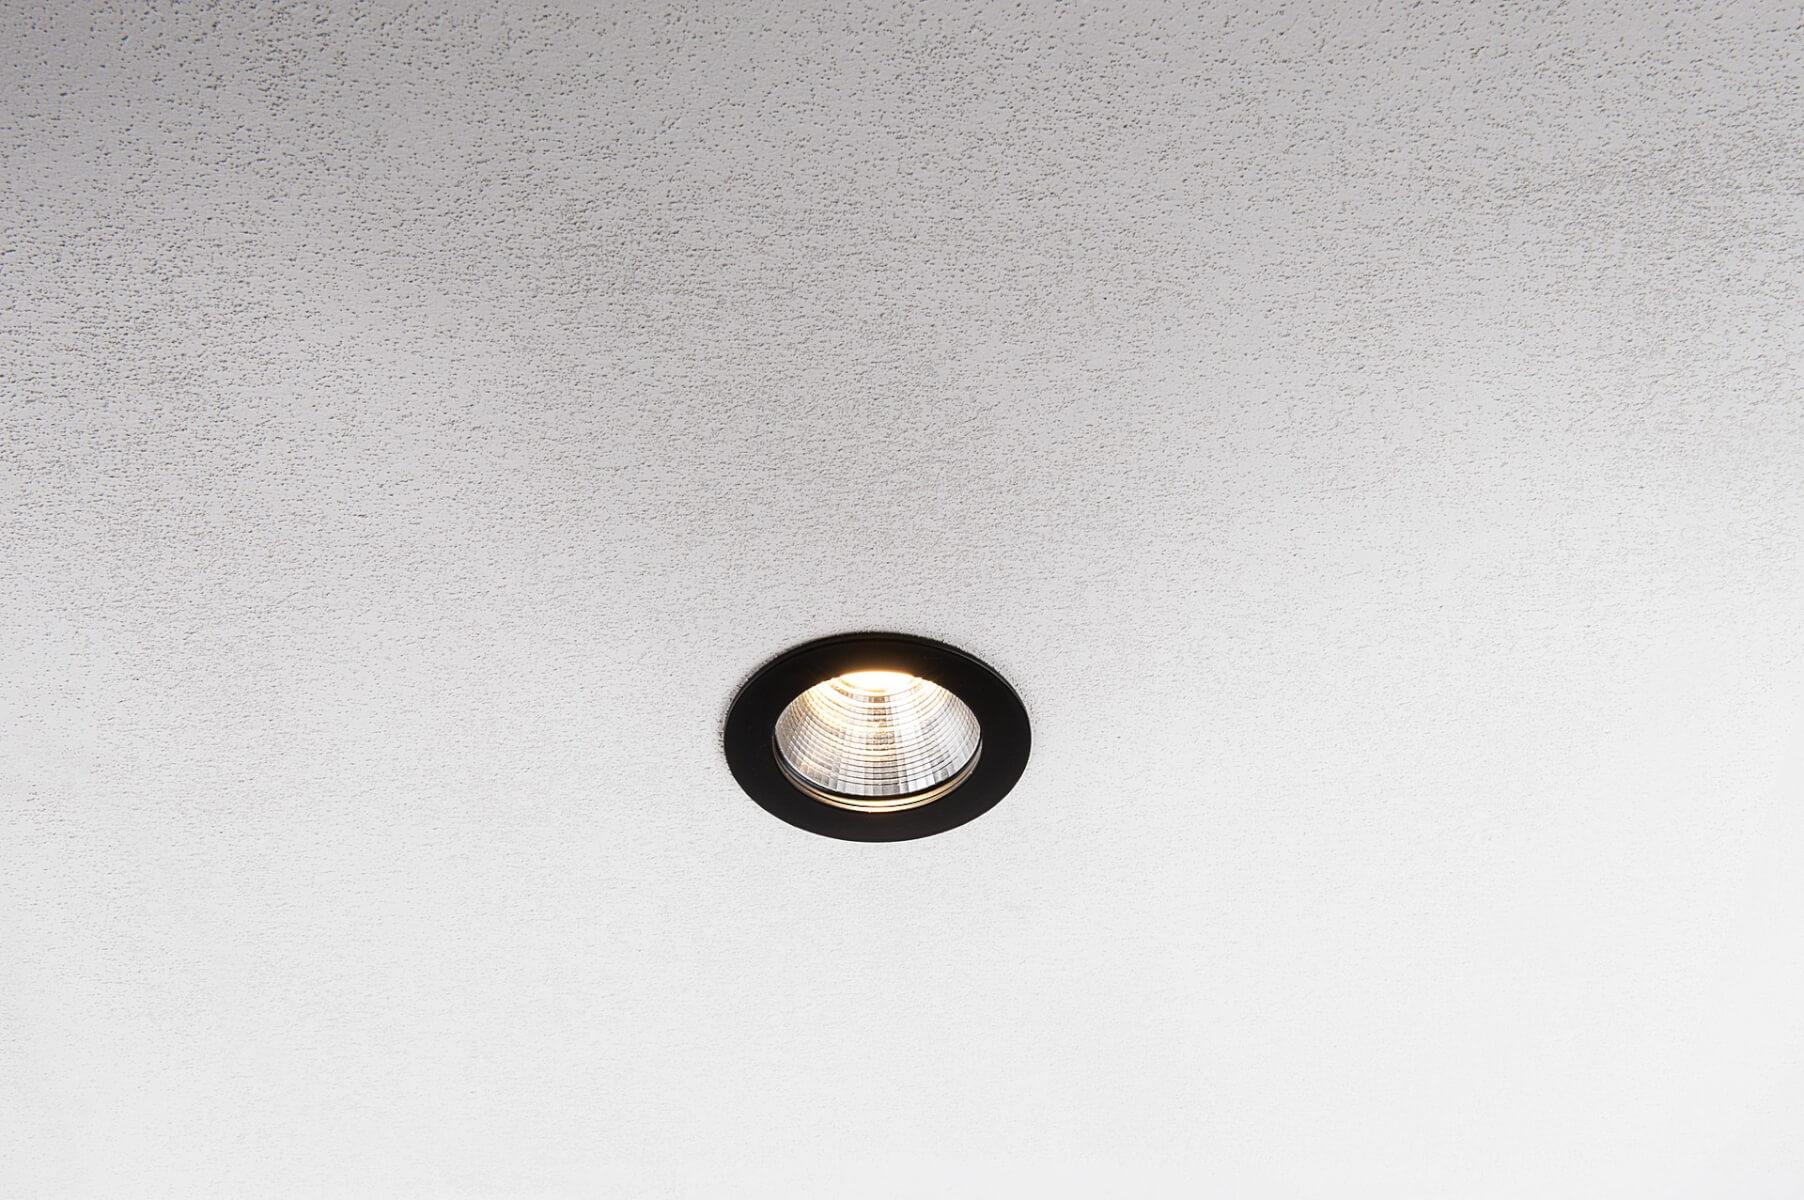 SOLLO R74 LED